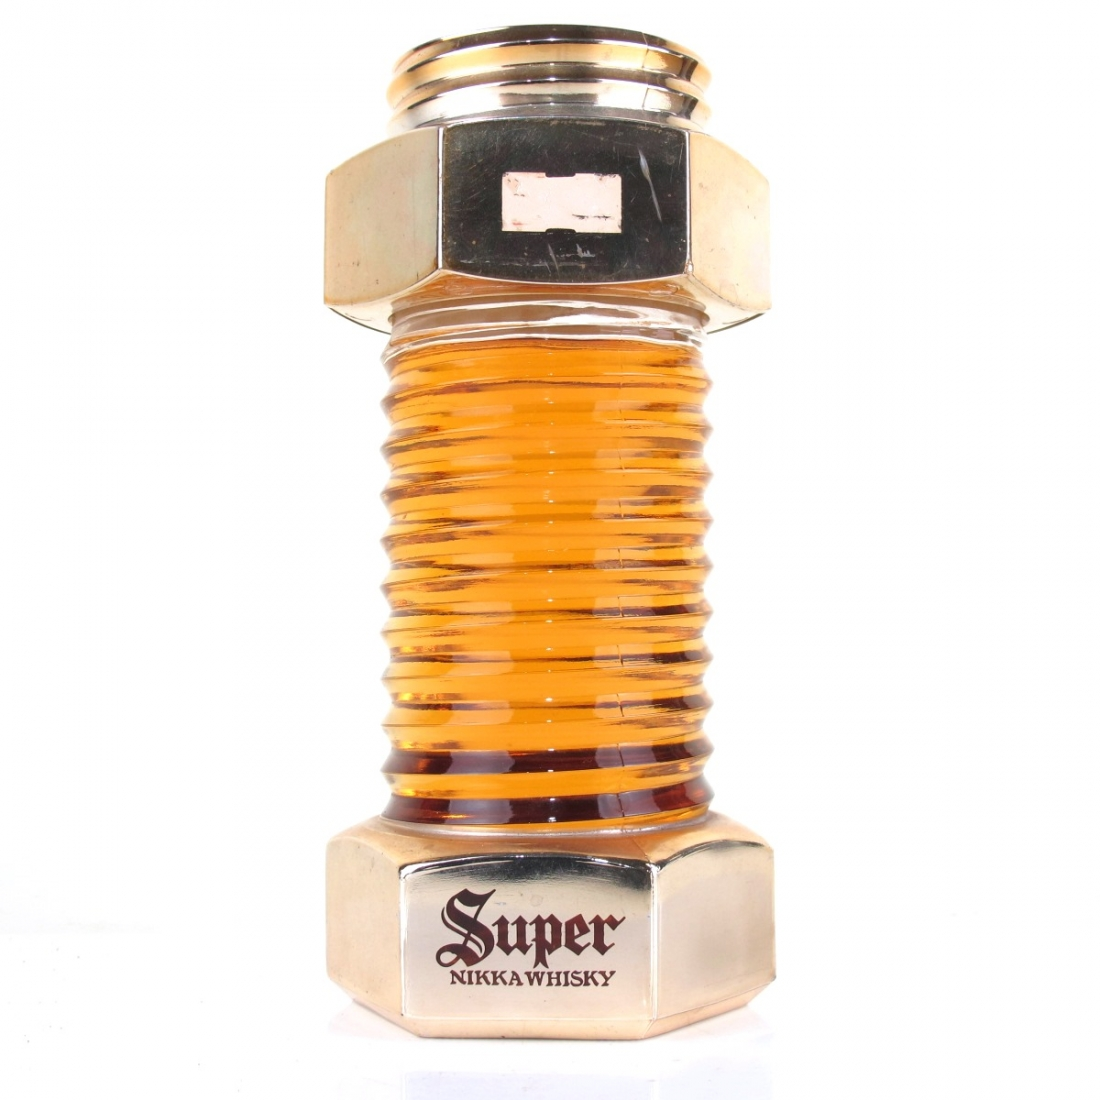 Nikka Super Whisky Bolt 50cl